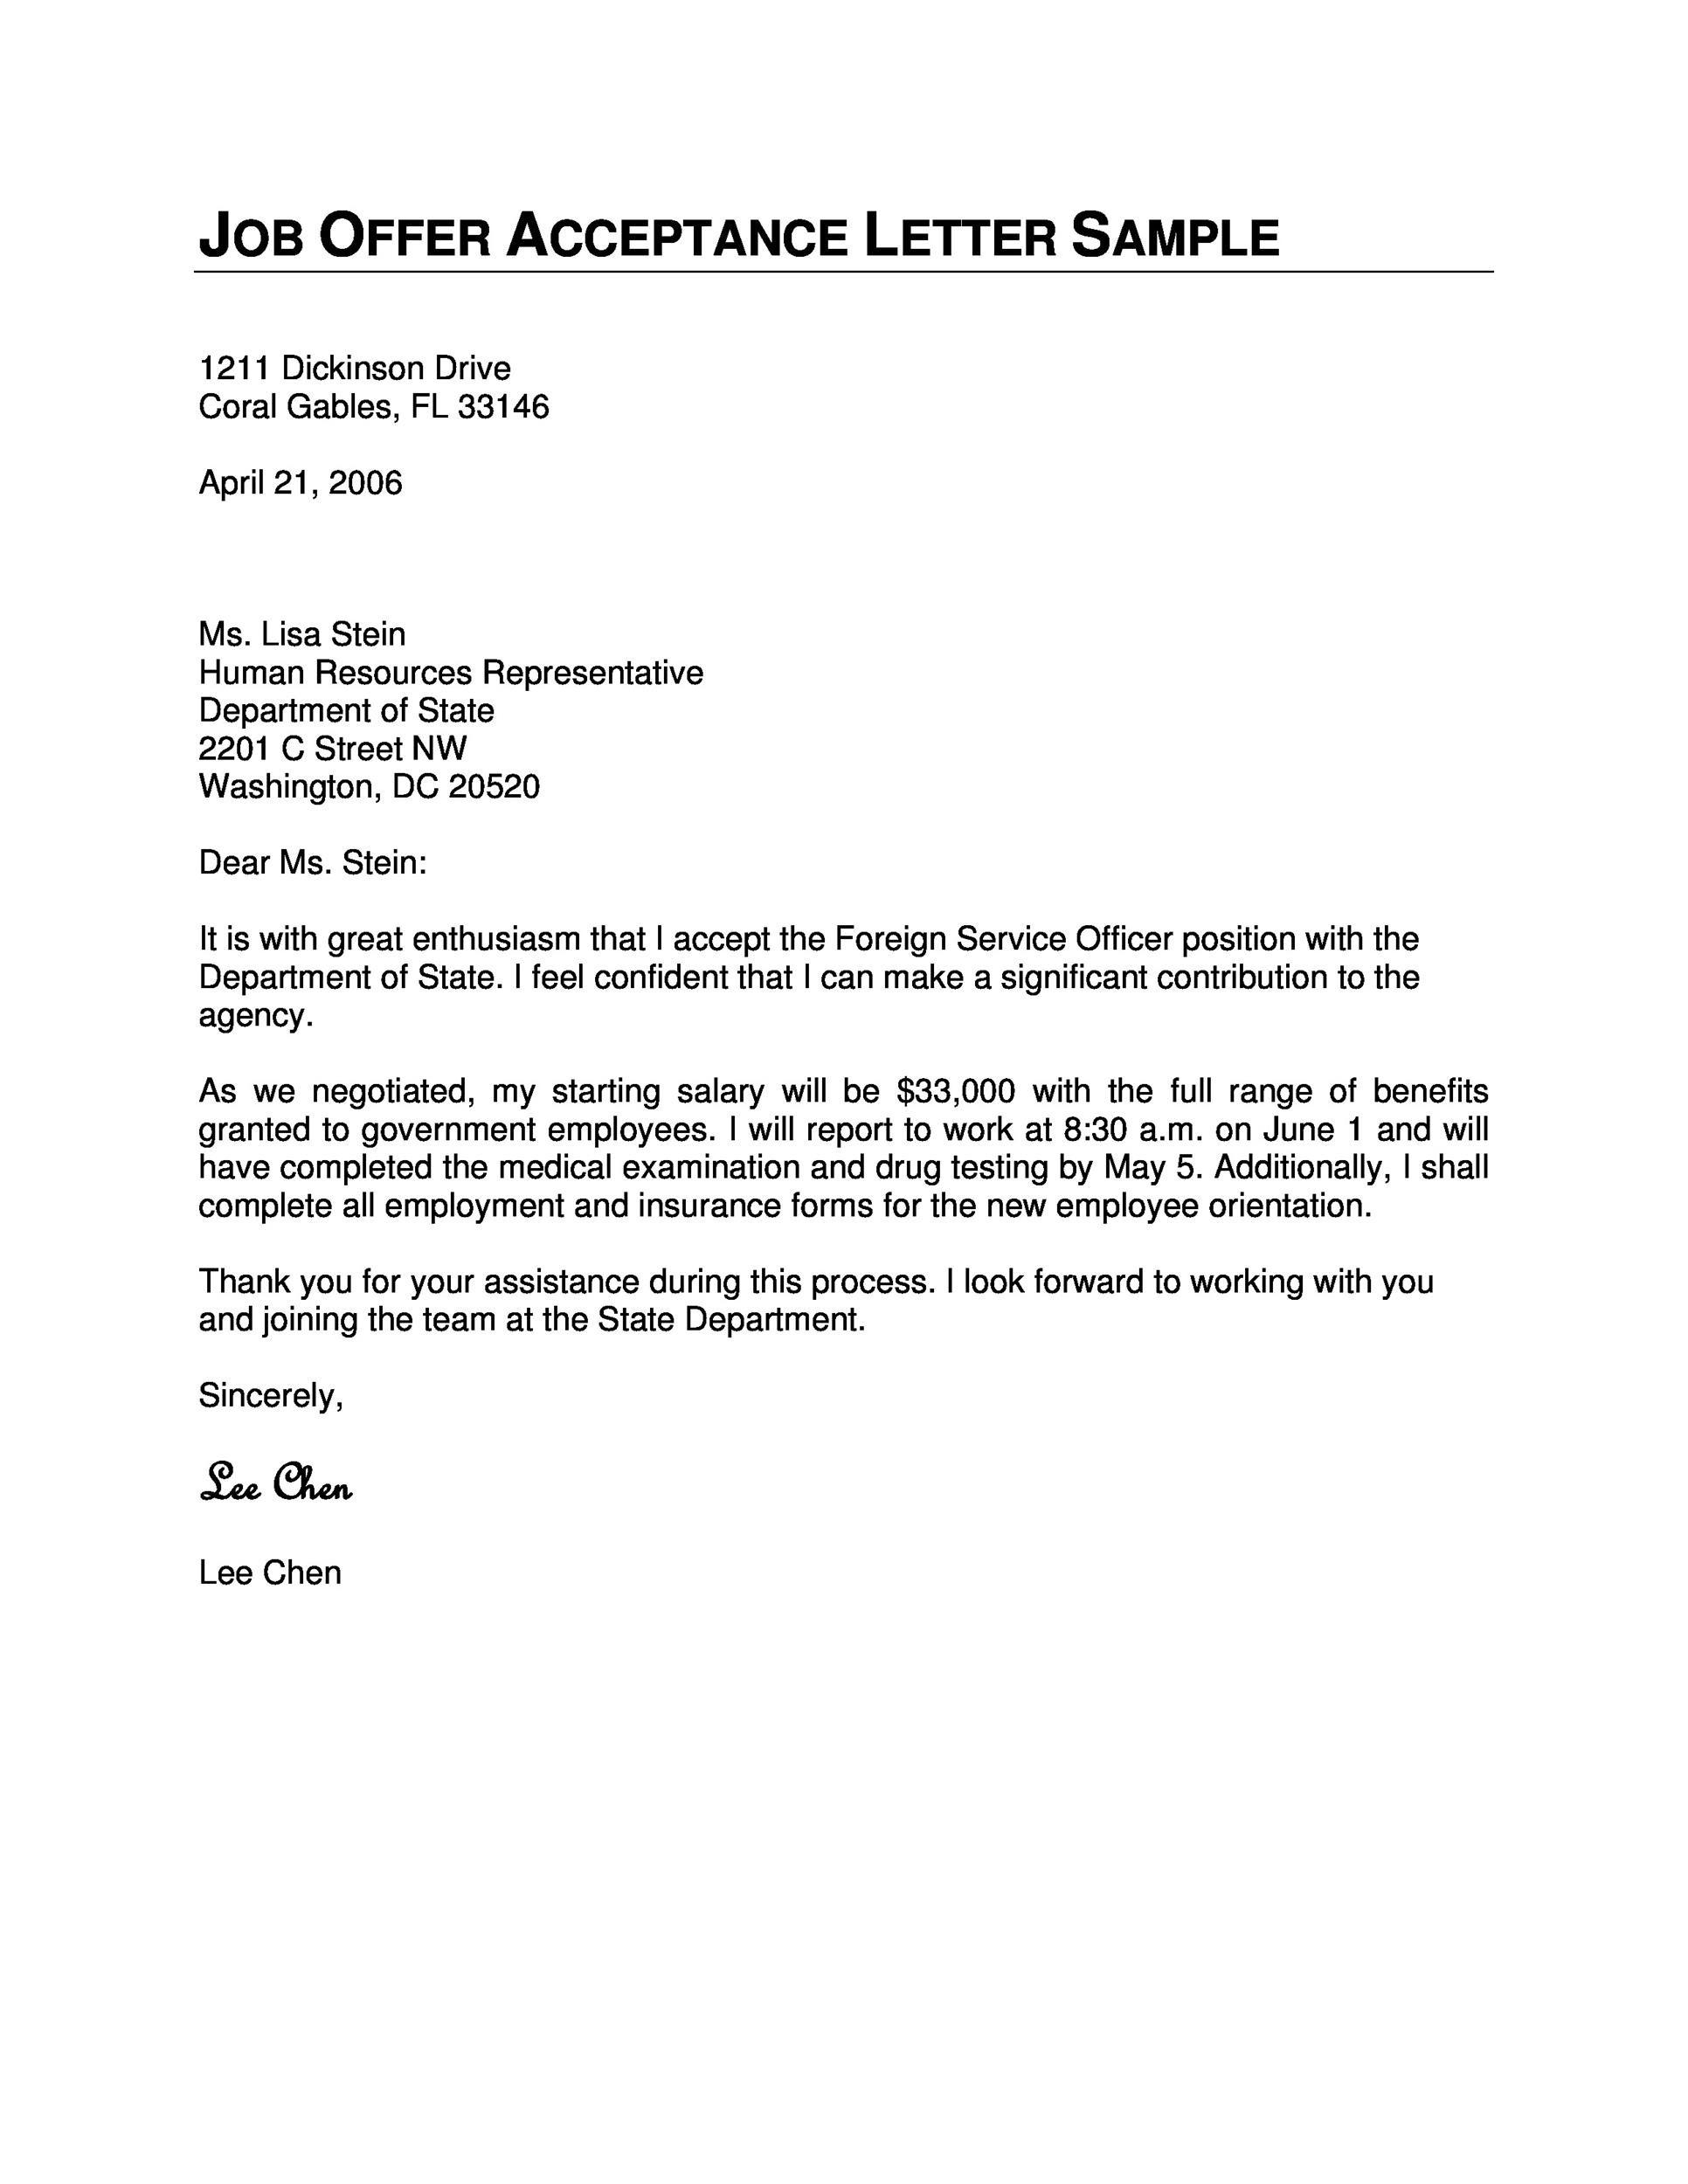 Free job acceptance letter 15